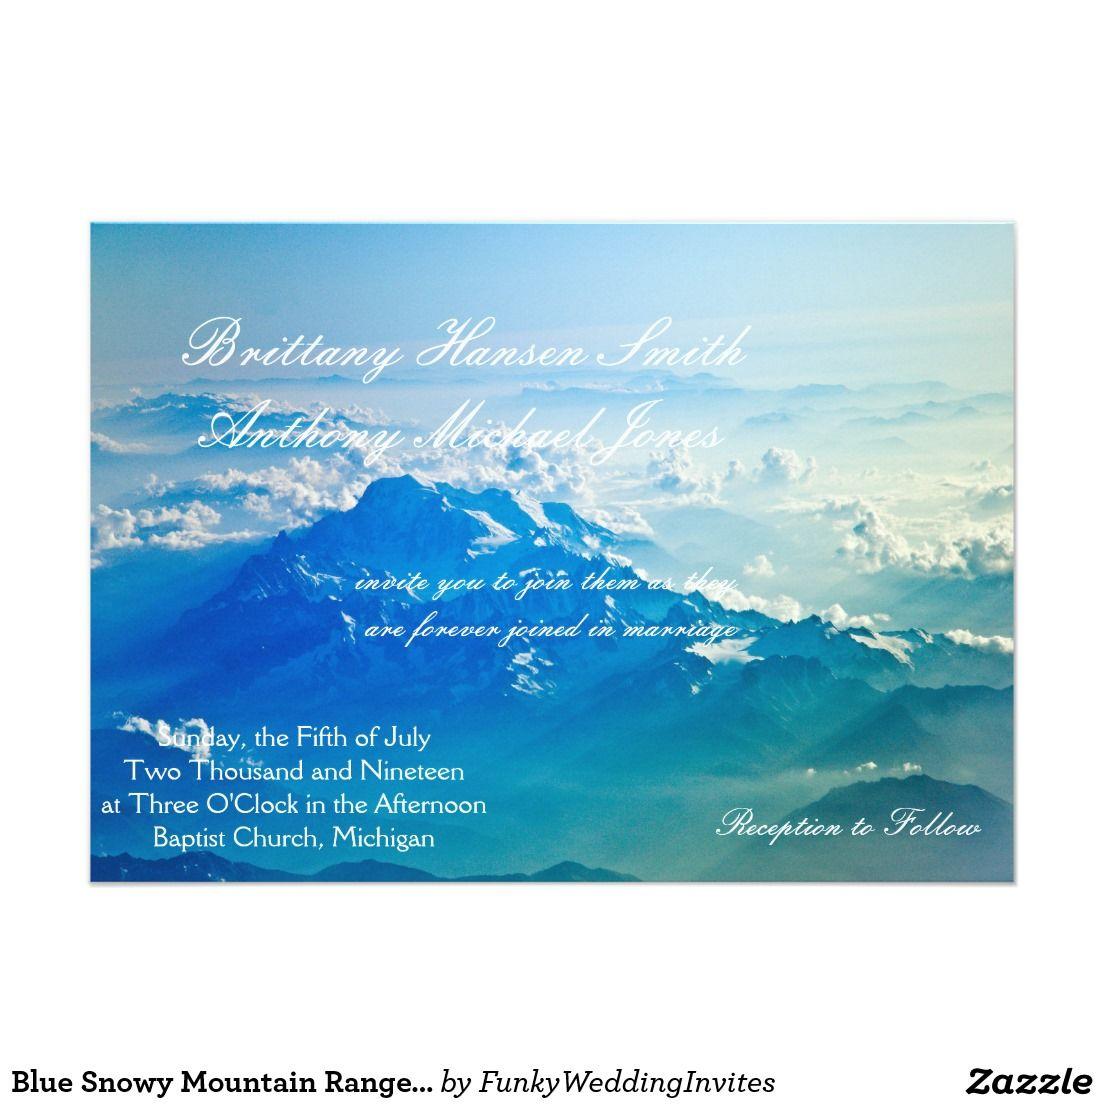 Blue Snowy Mountain Range Wedding Invitation | Mountain Wedding ...